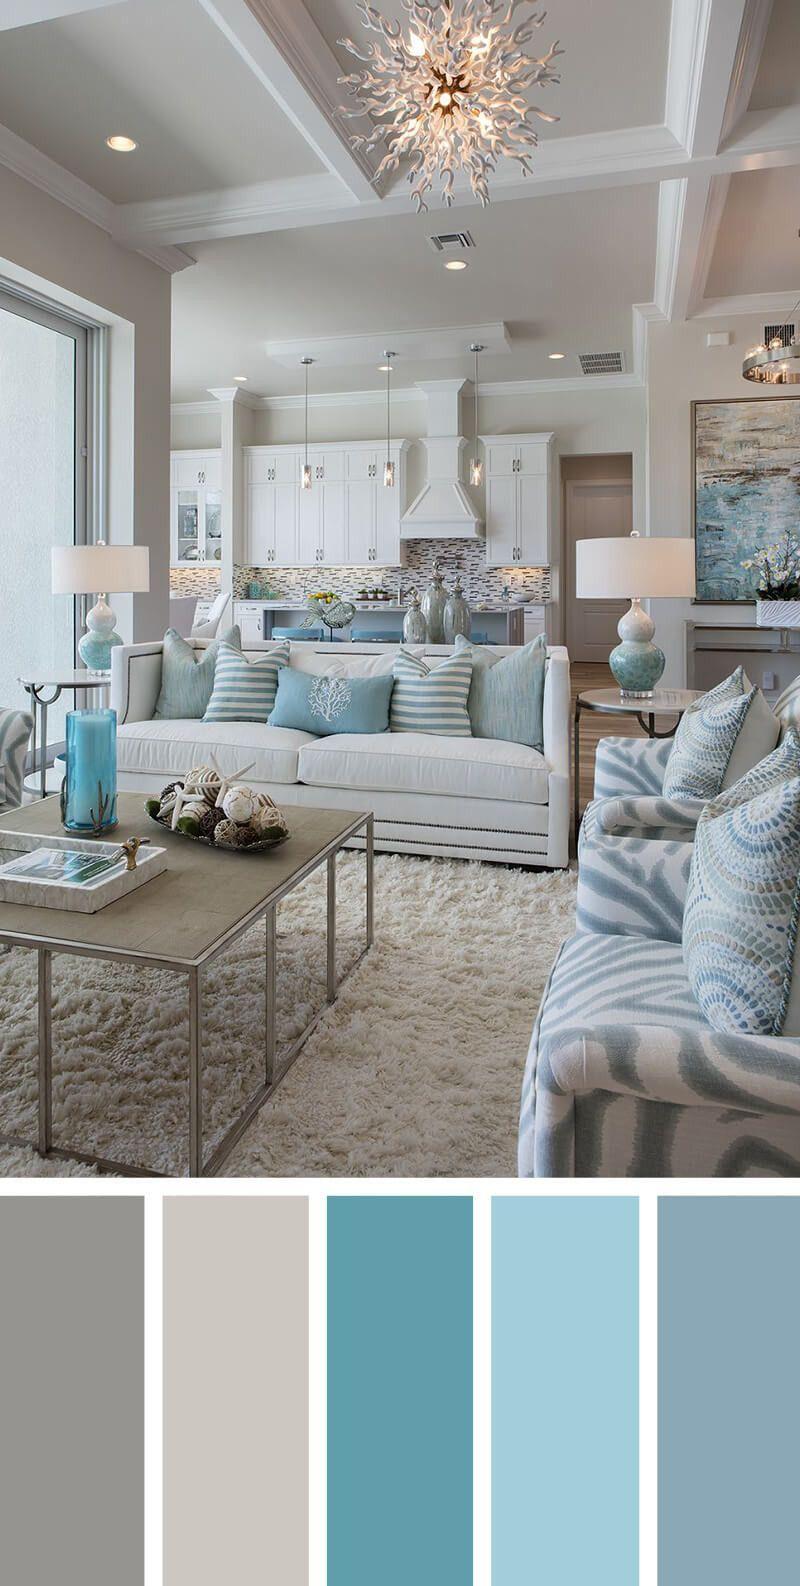 Photo of Best 20 Family Room Color Ideas #livingroompaintcolorideas Best ideas about Fami…